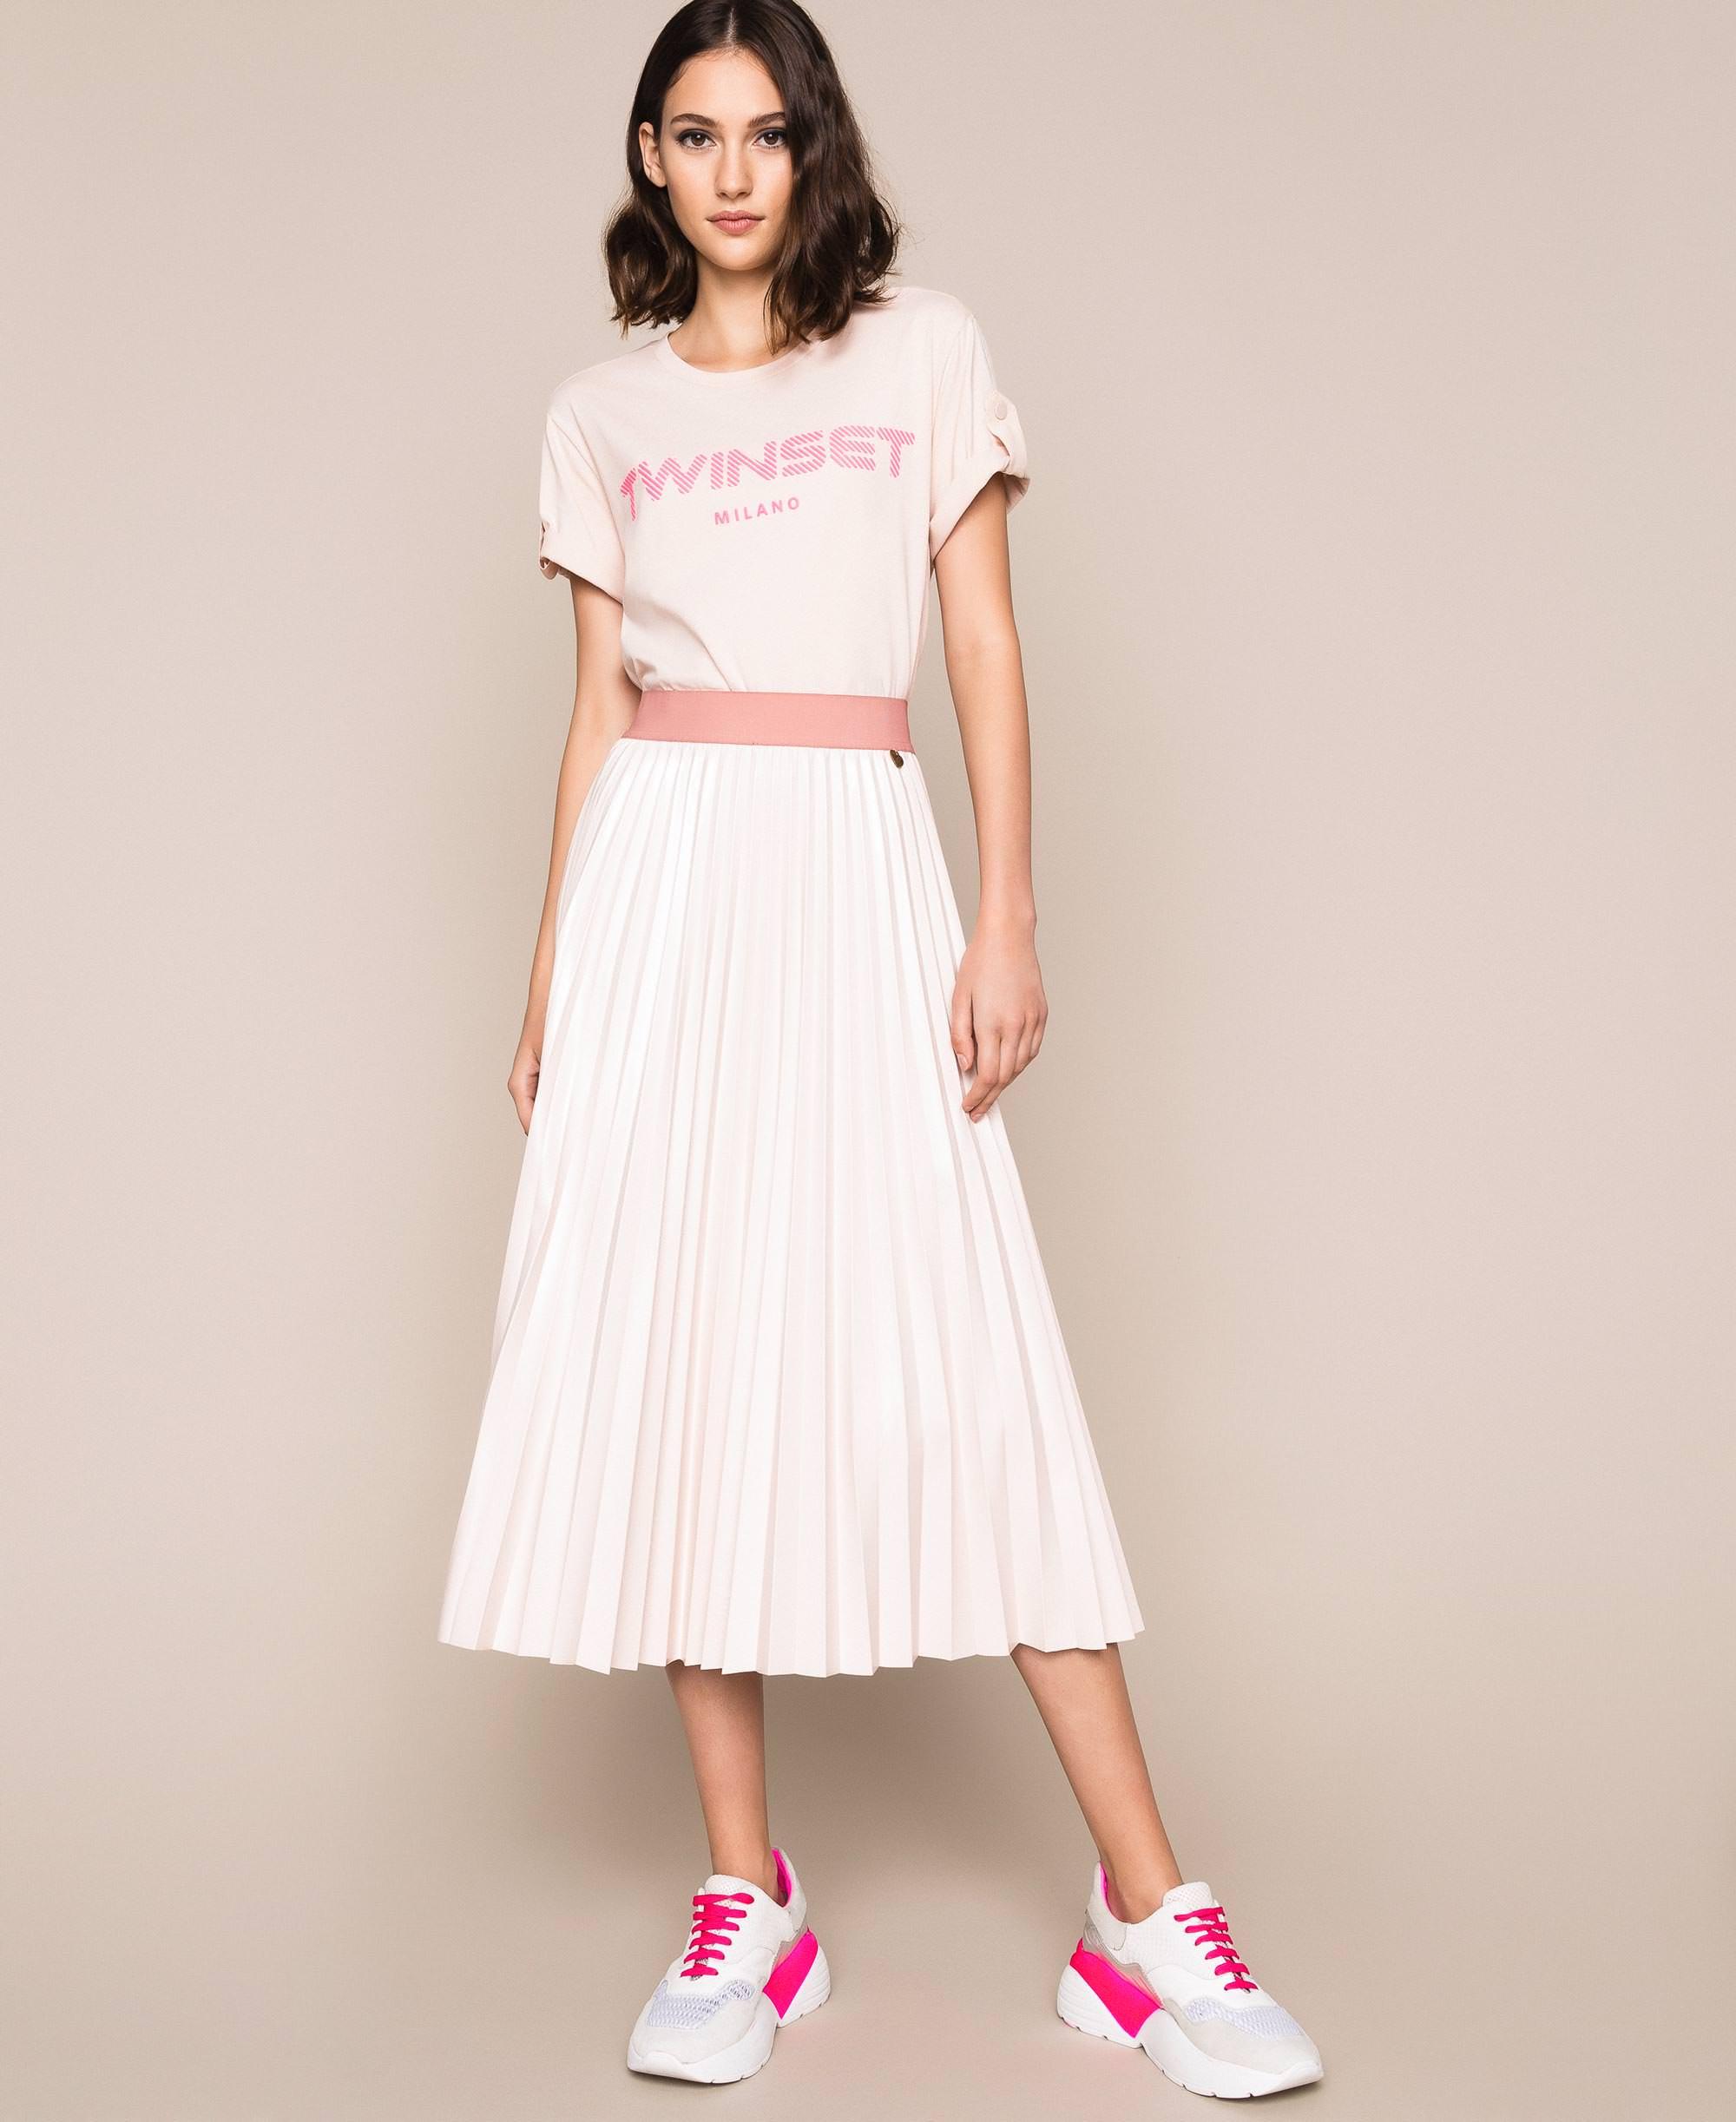 С чем носить кожаную юбку-карандаш - фото 2020 | Шкатулка красоты | 2445x2000